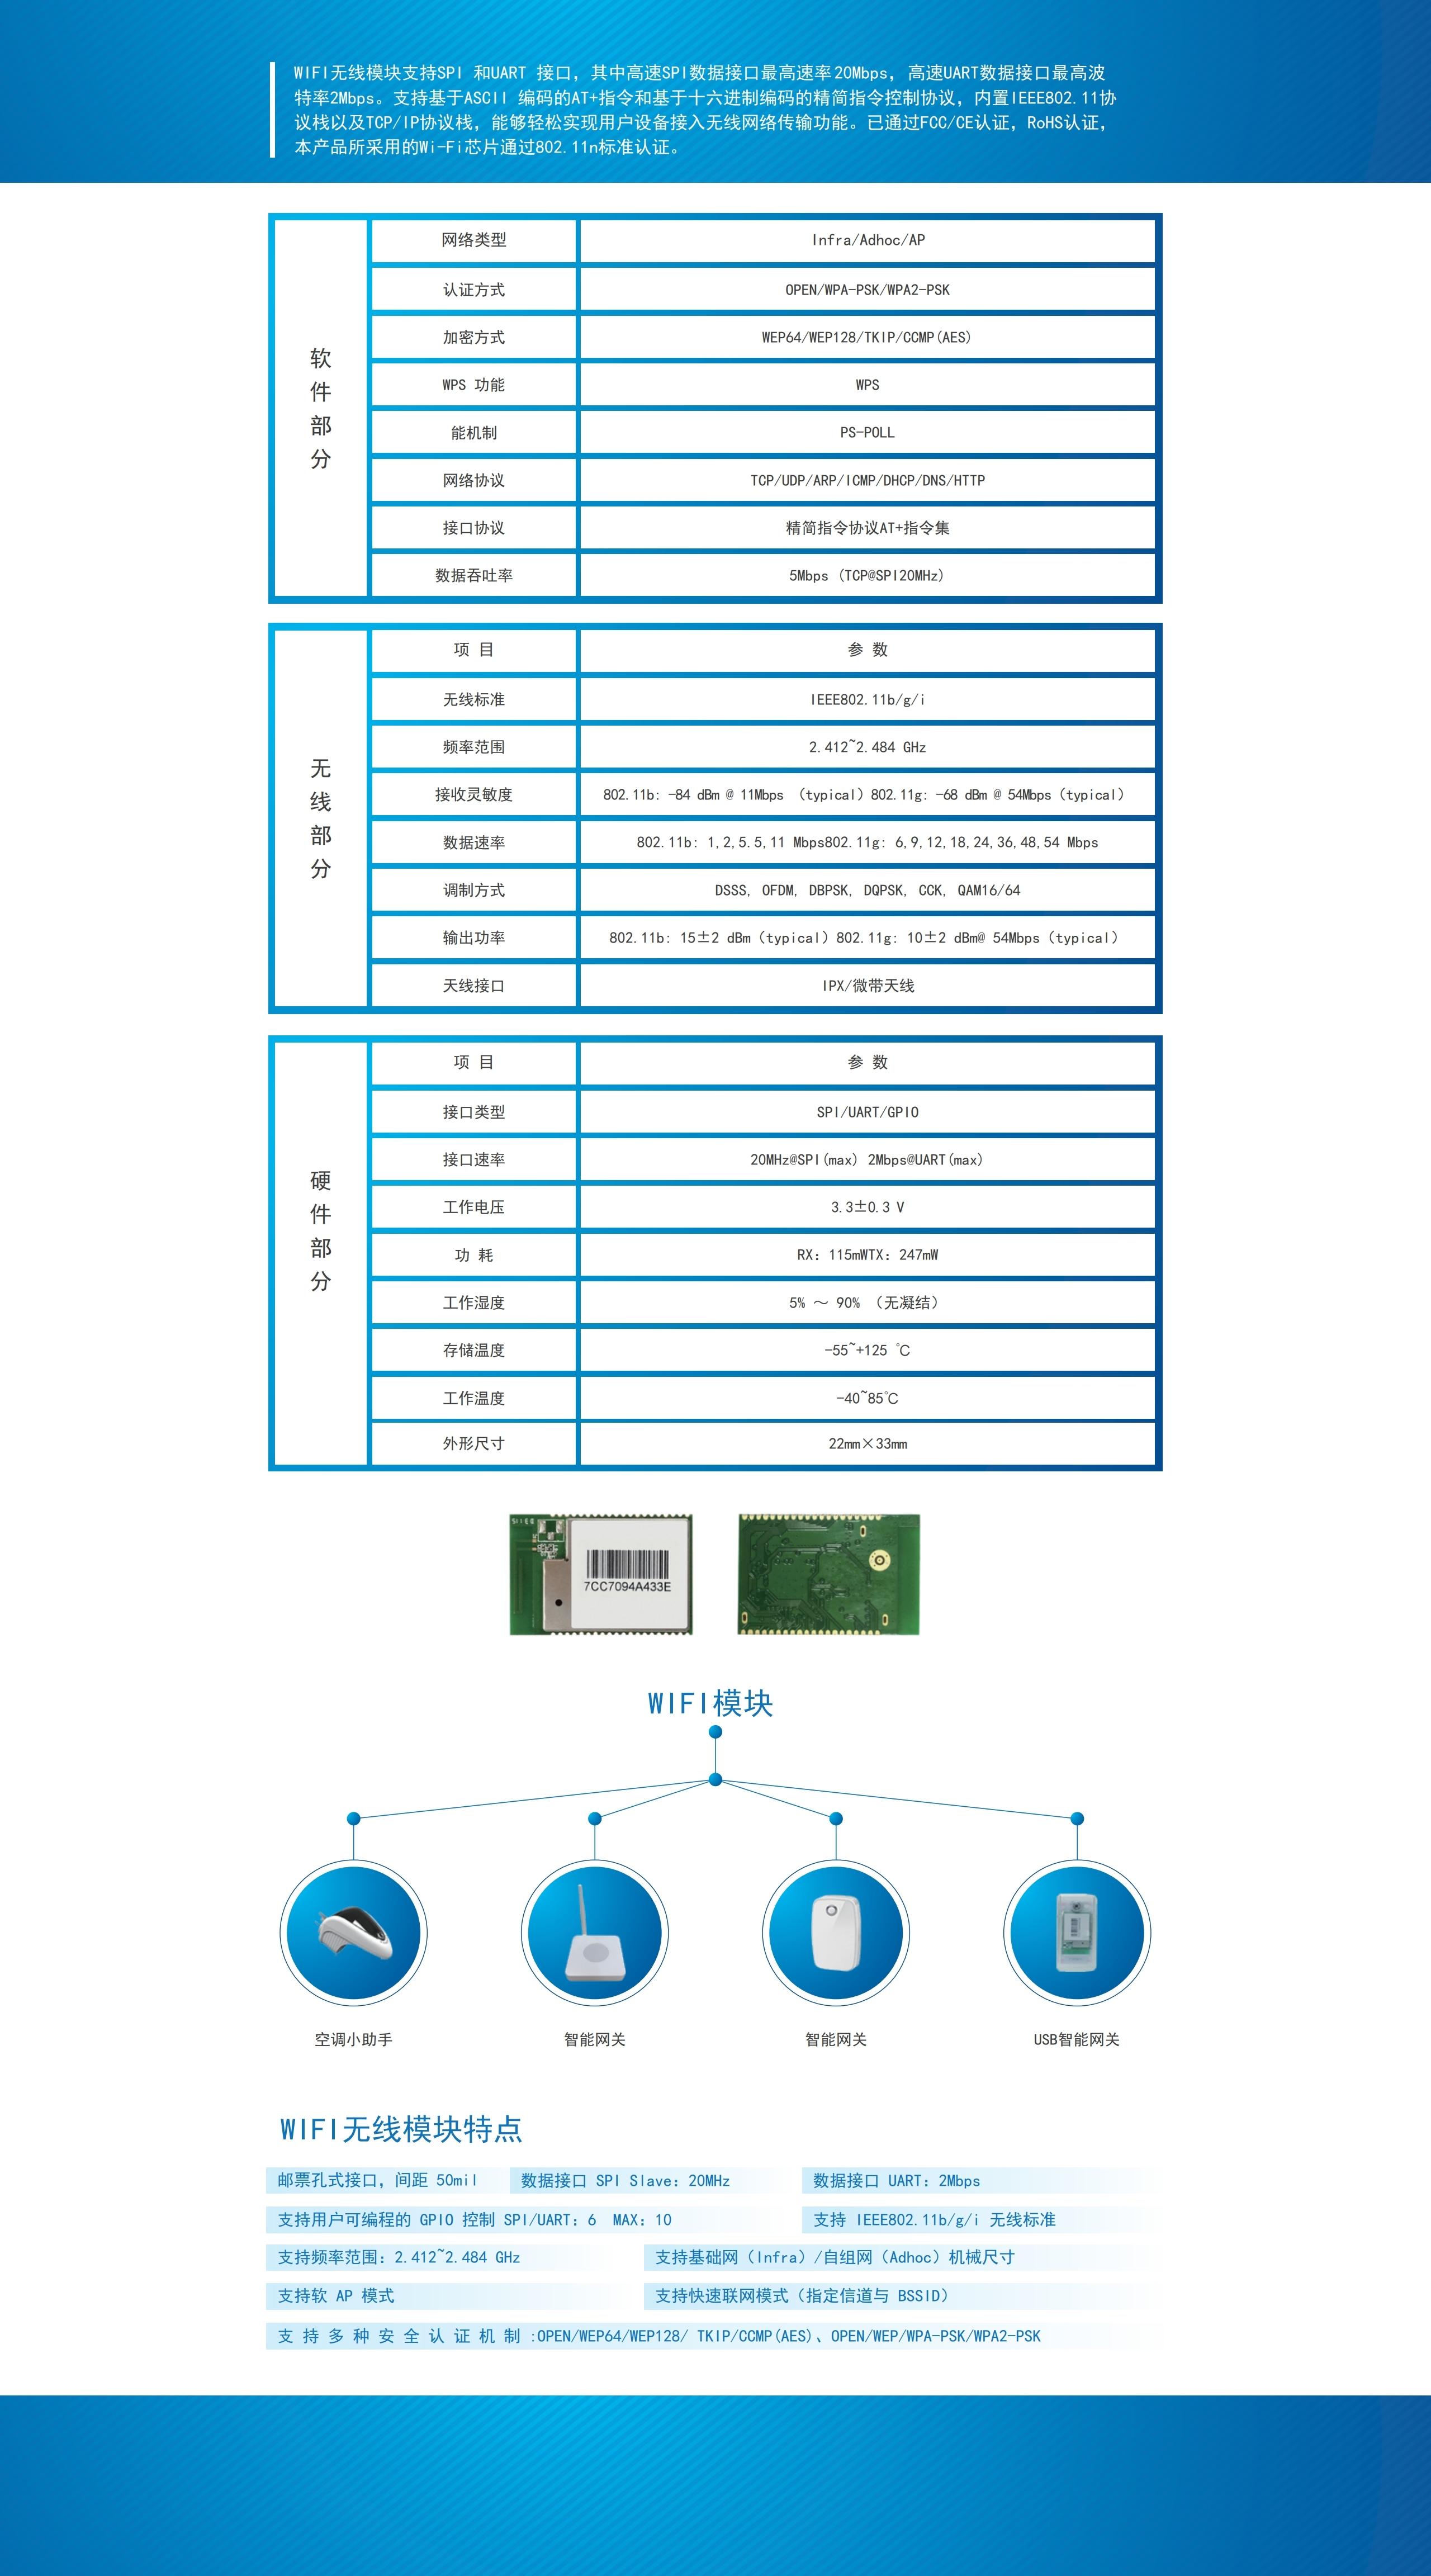 WiFi模块.pdf_page_1.jpg